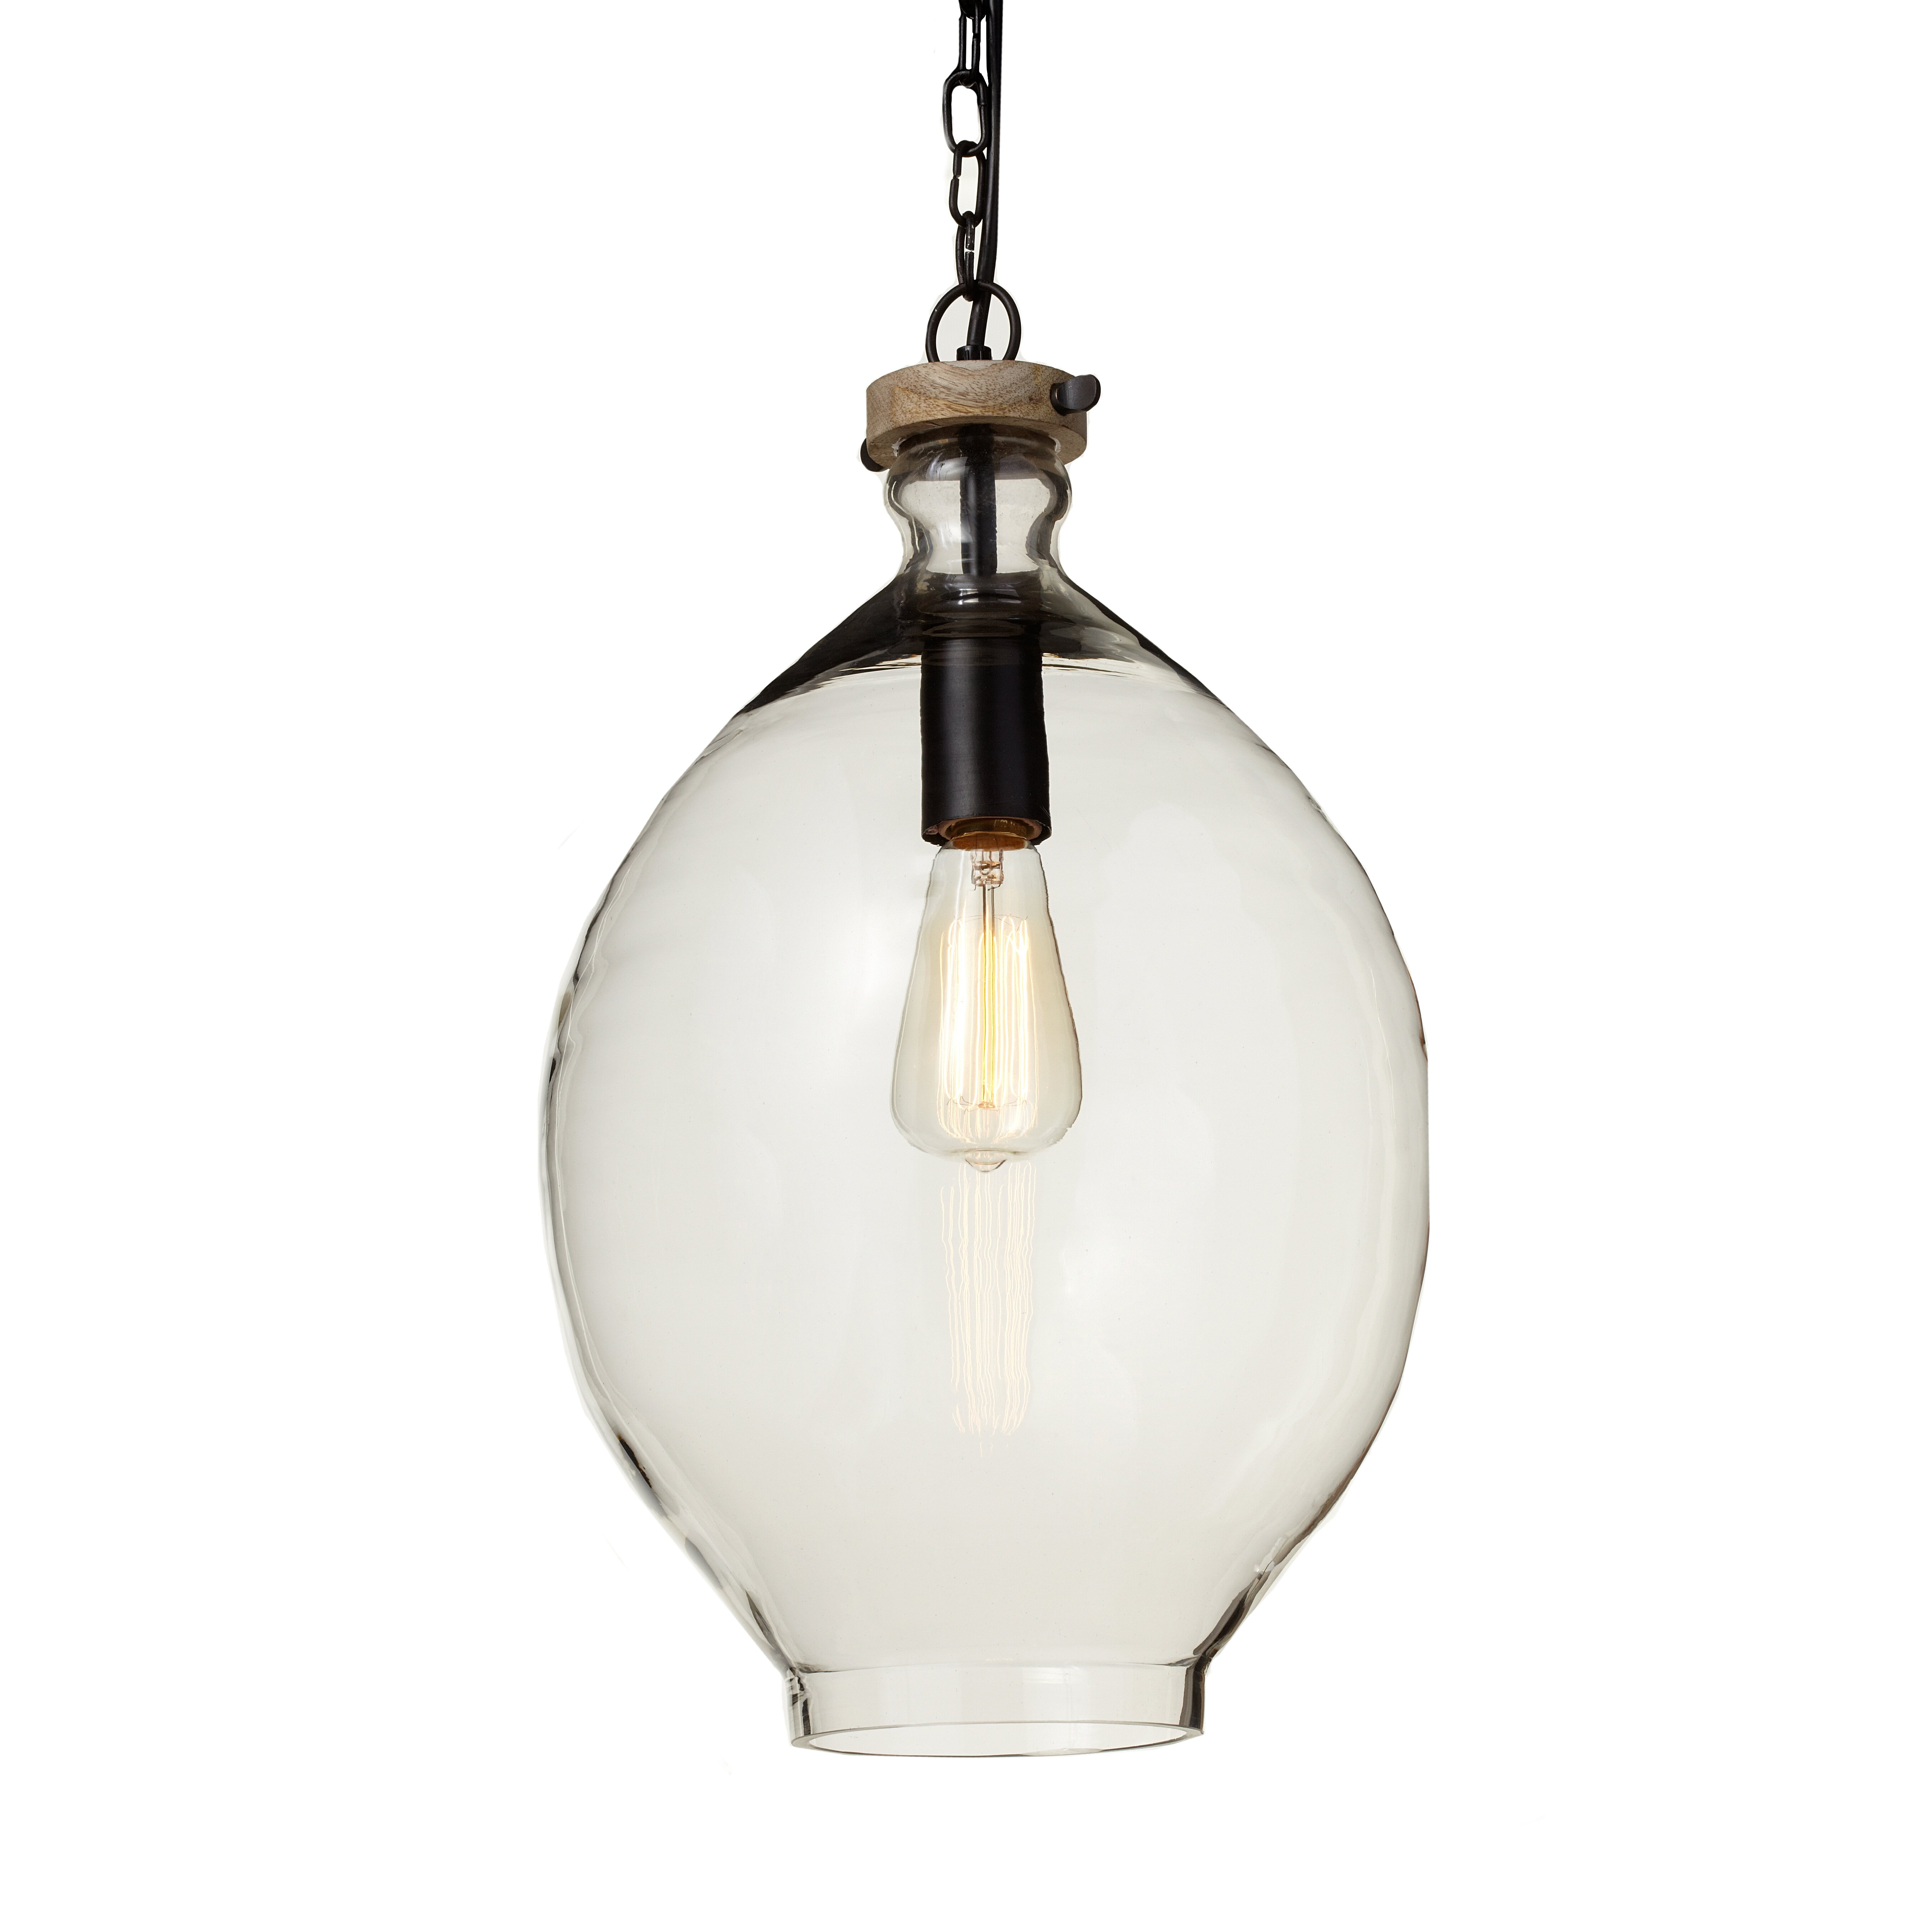 Sage co industrial garden 1 light mini pendant for Wayfair industrial lamp